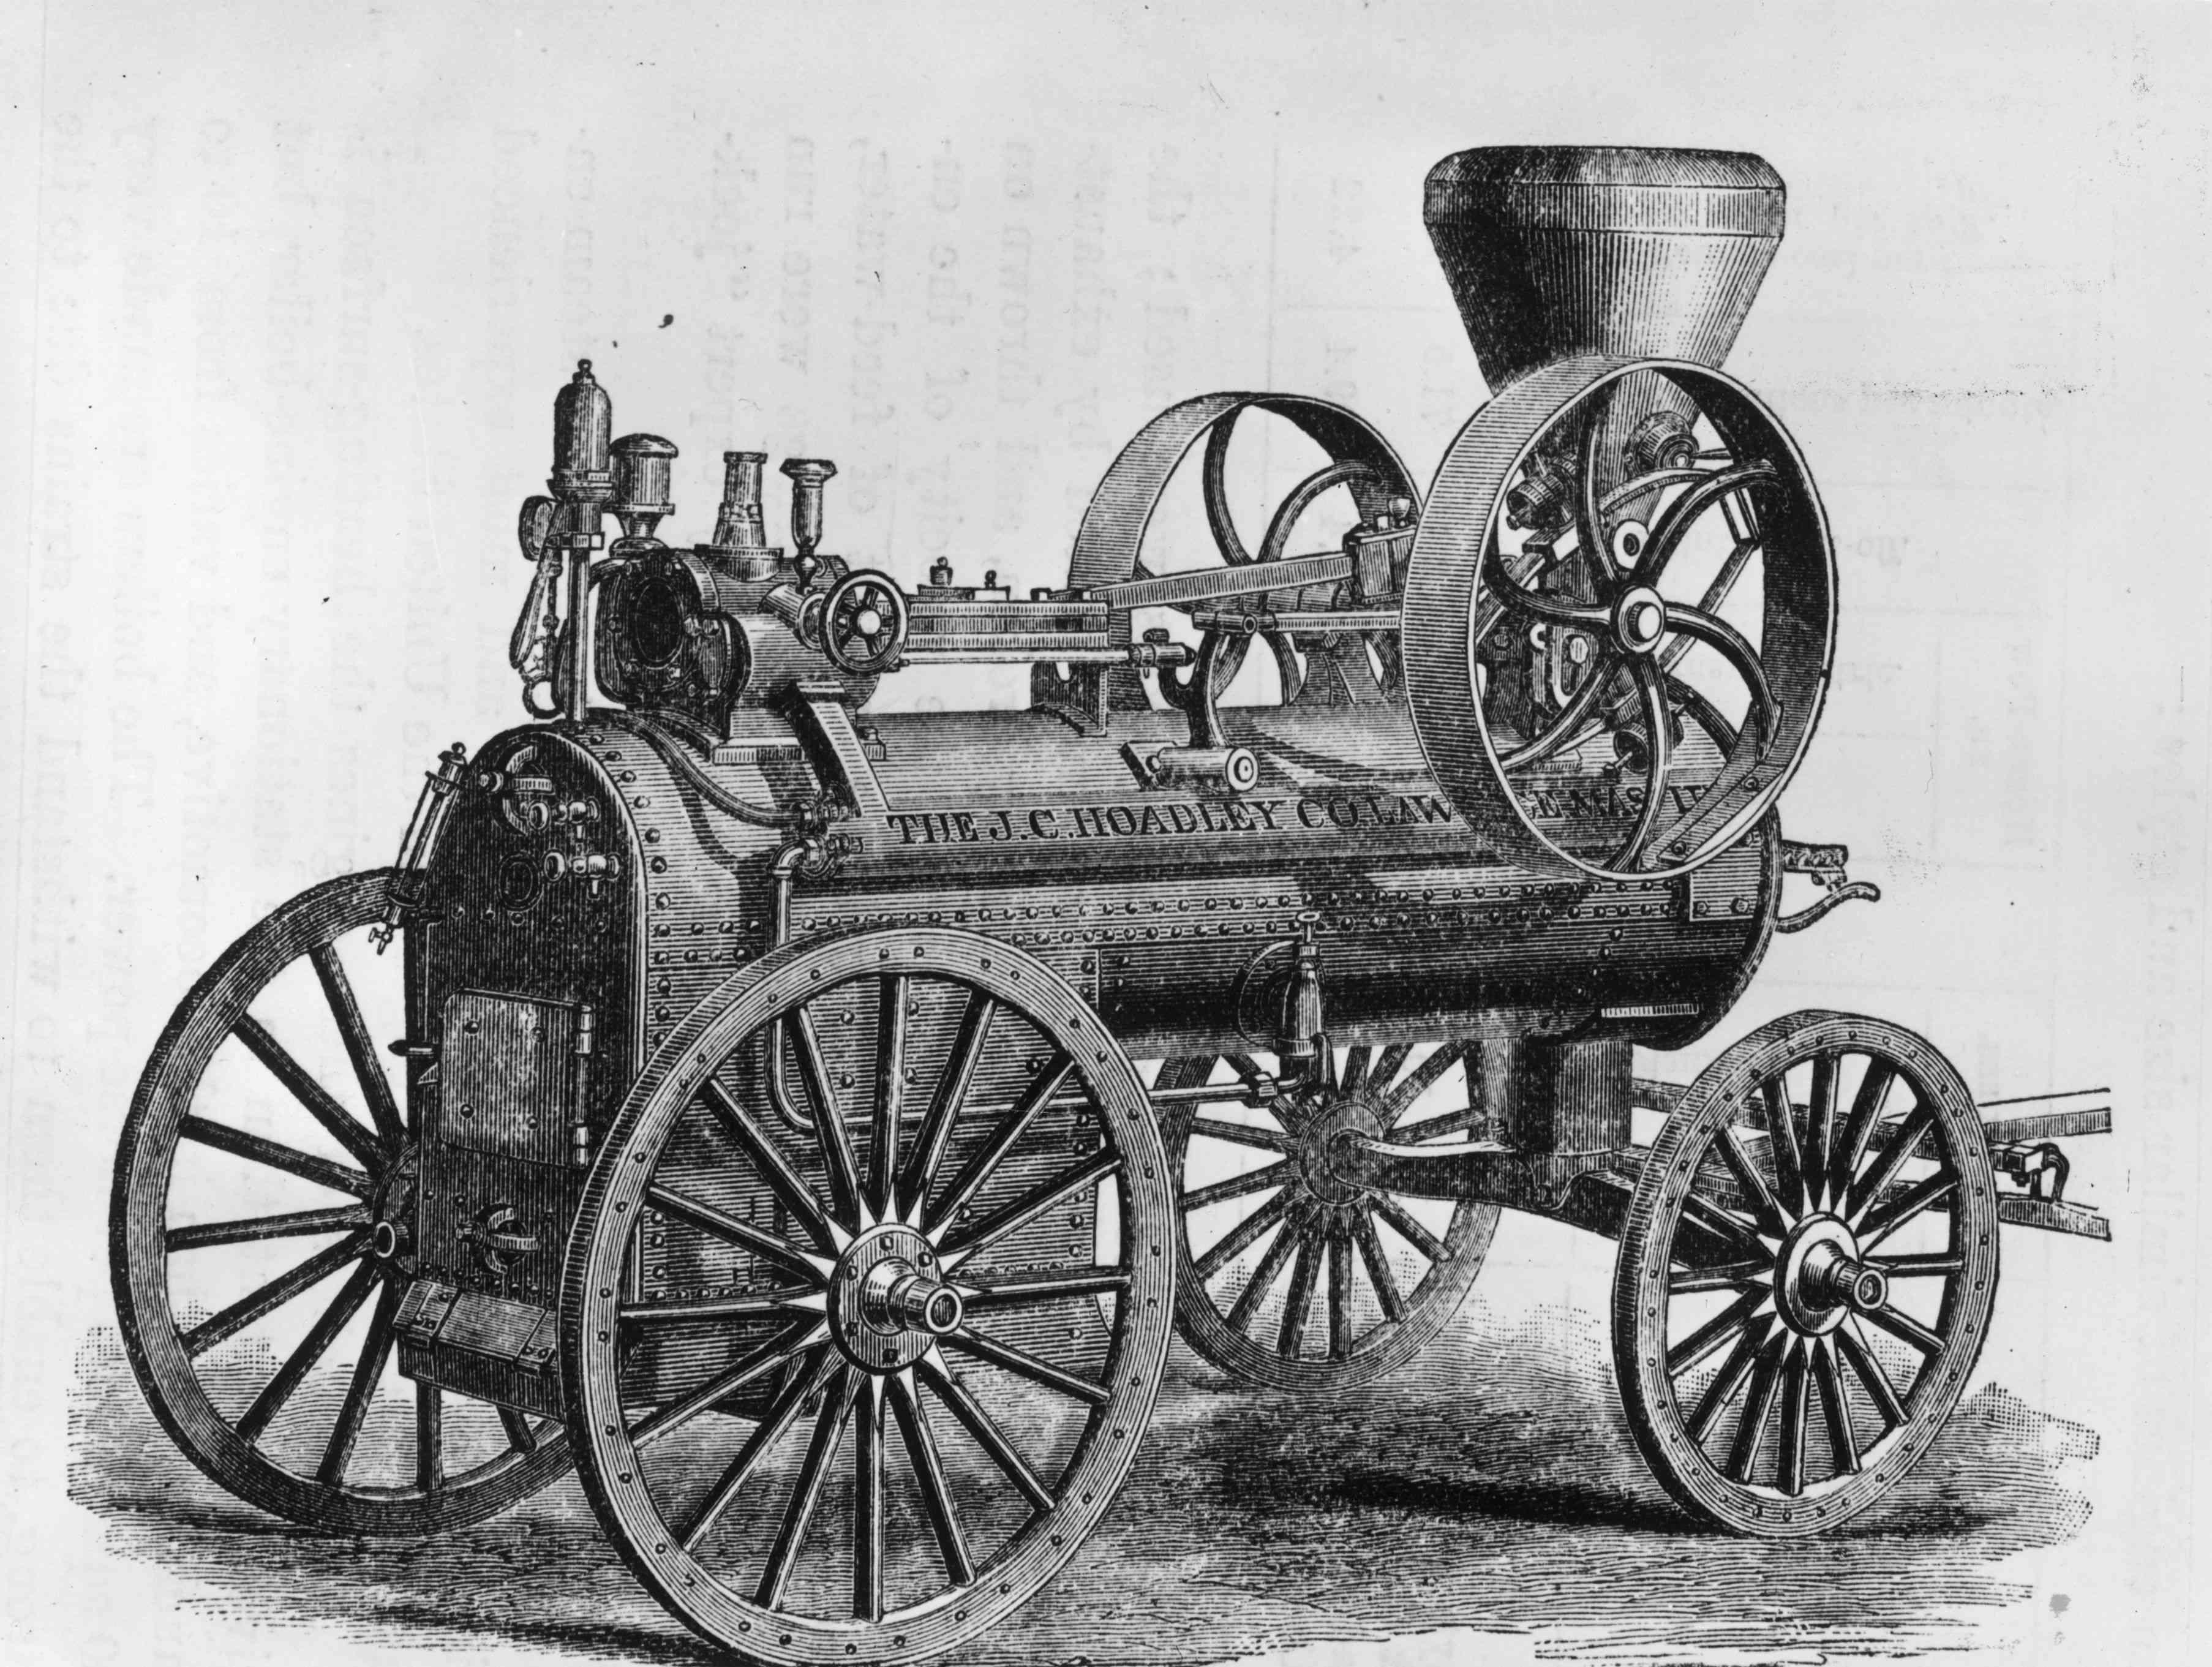 1787 drawing of a potable James Watt steam engine